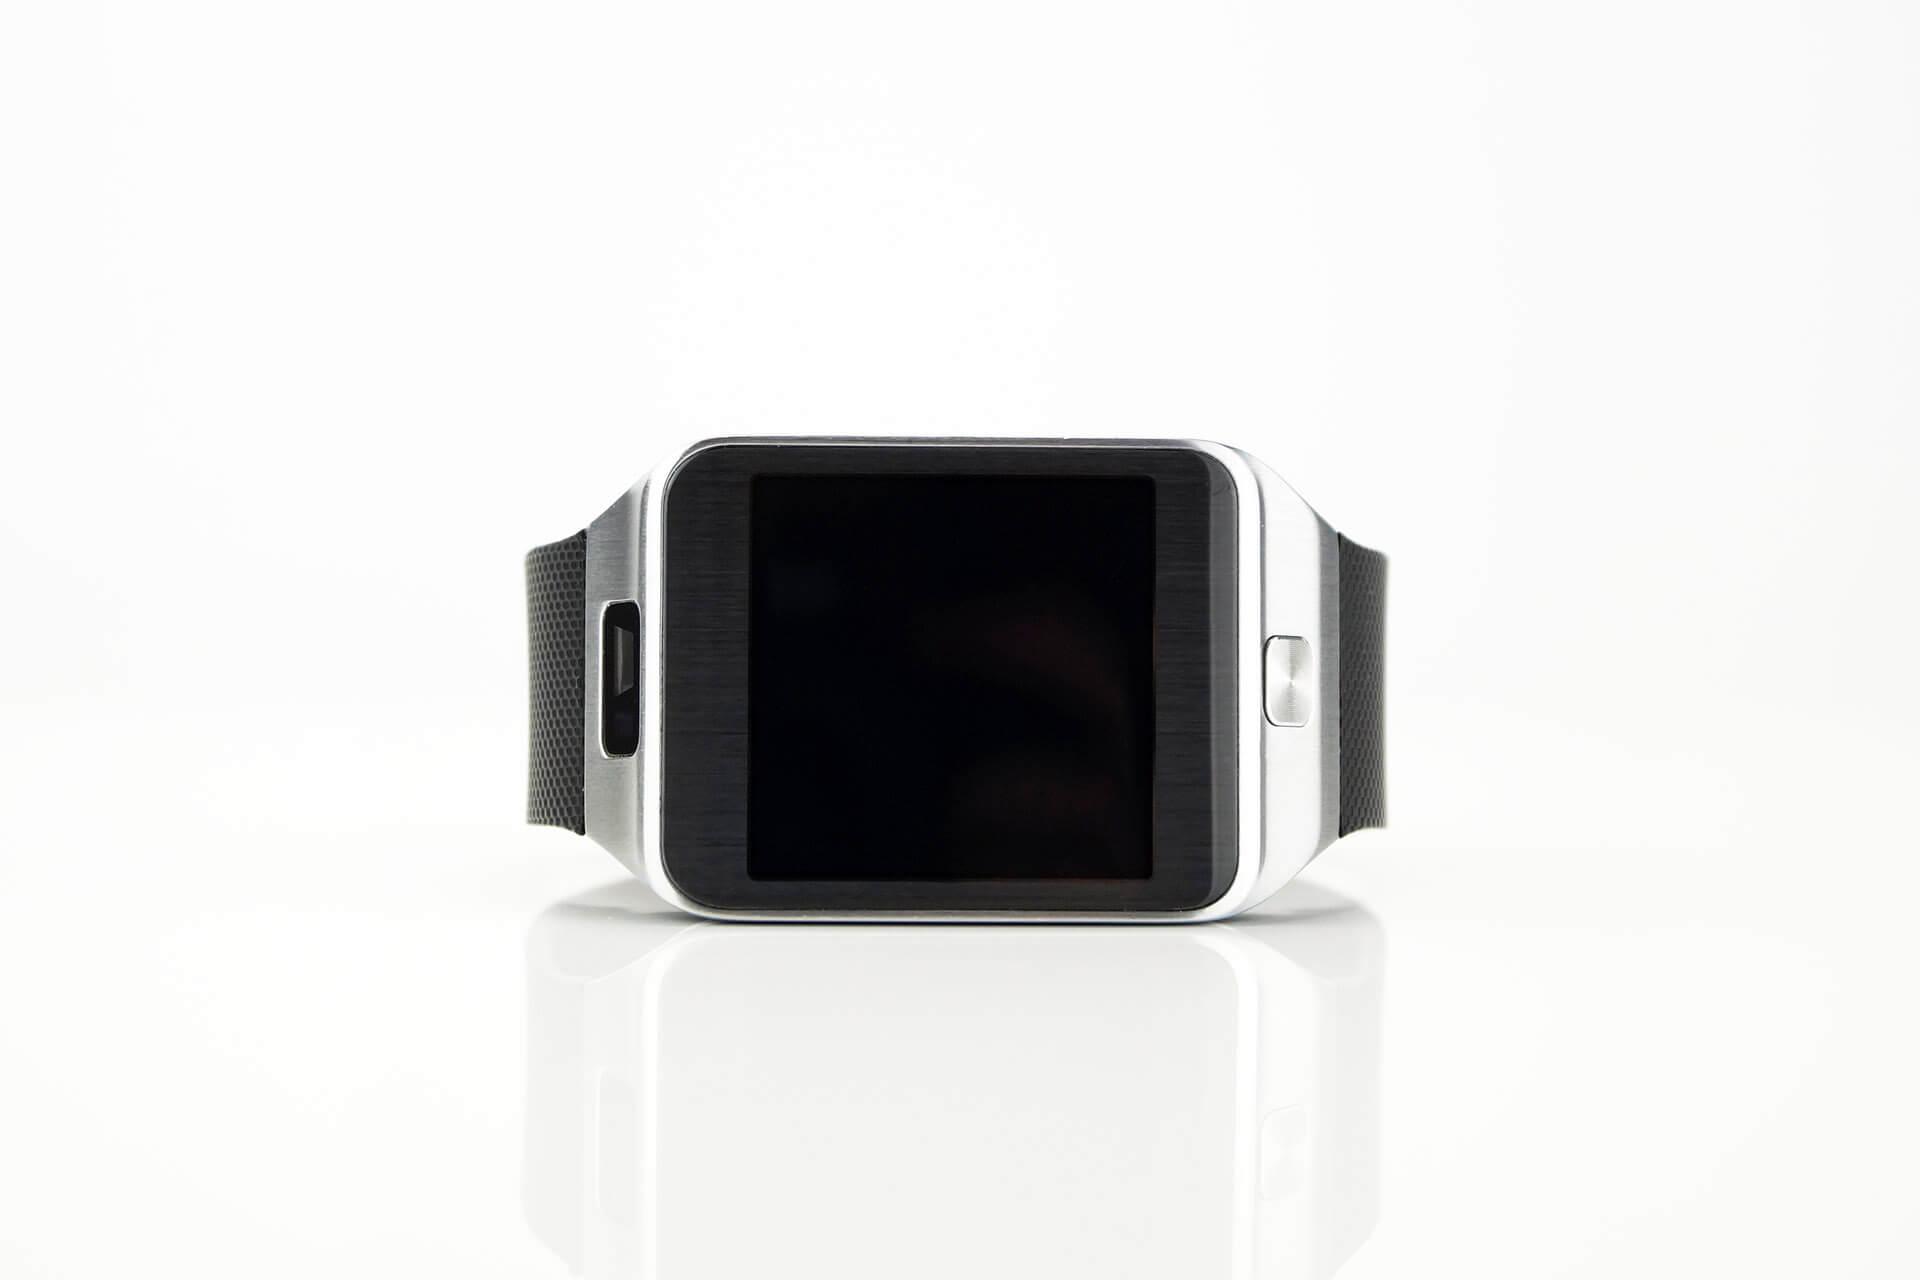 Smartwatch-Ankauf